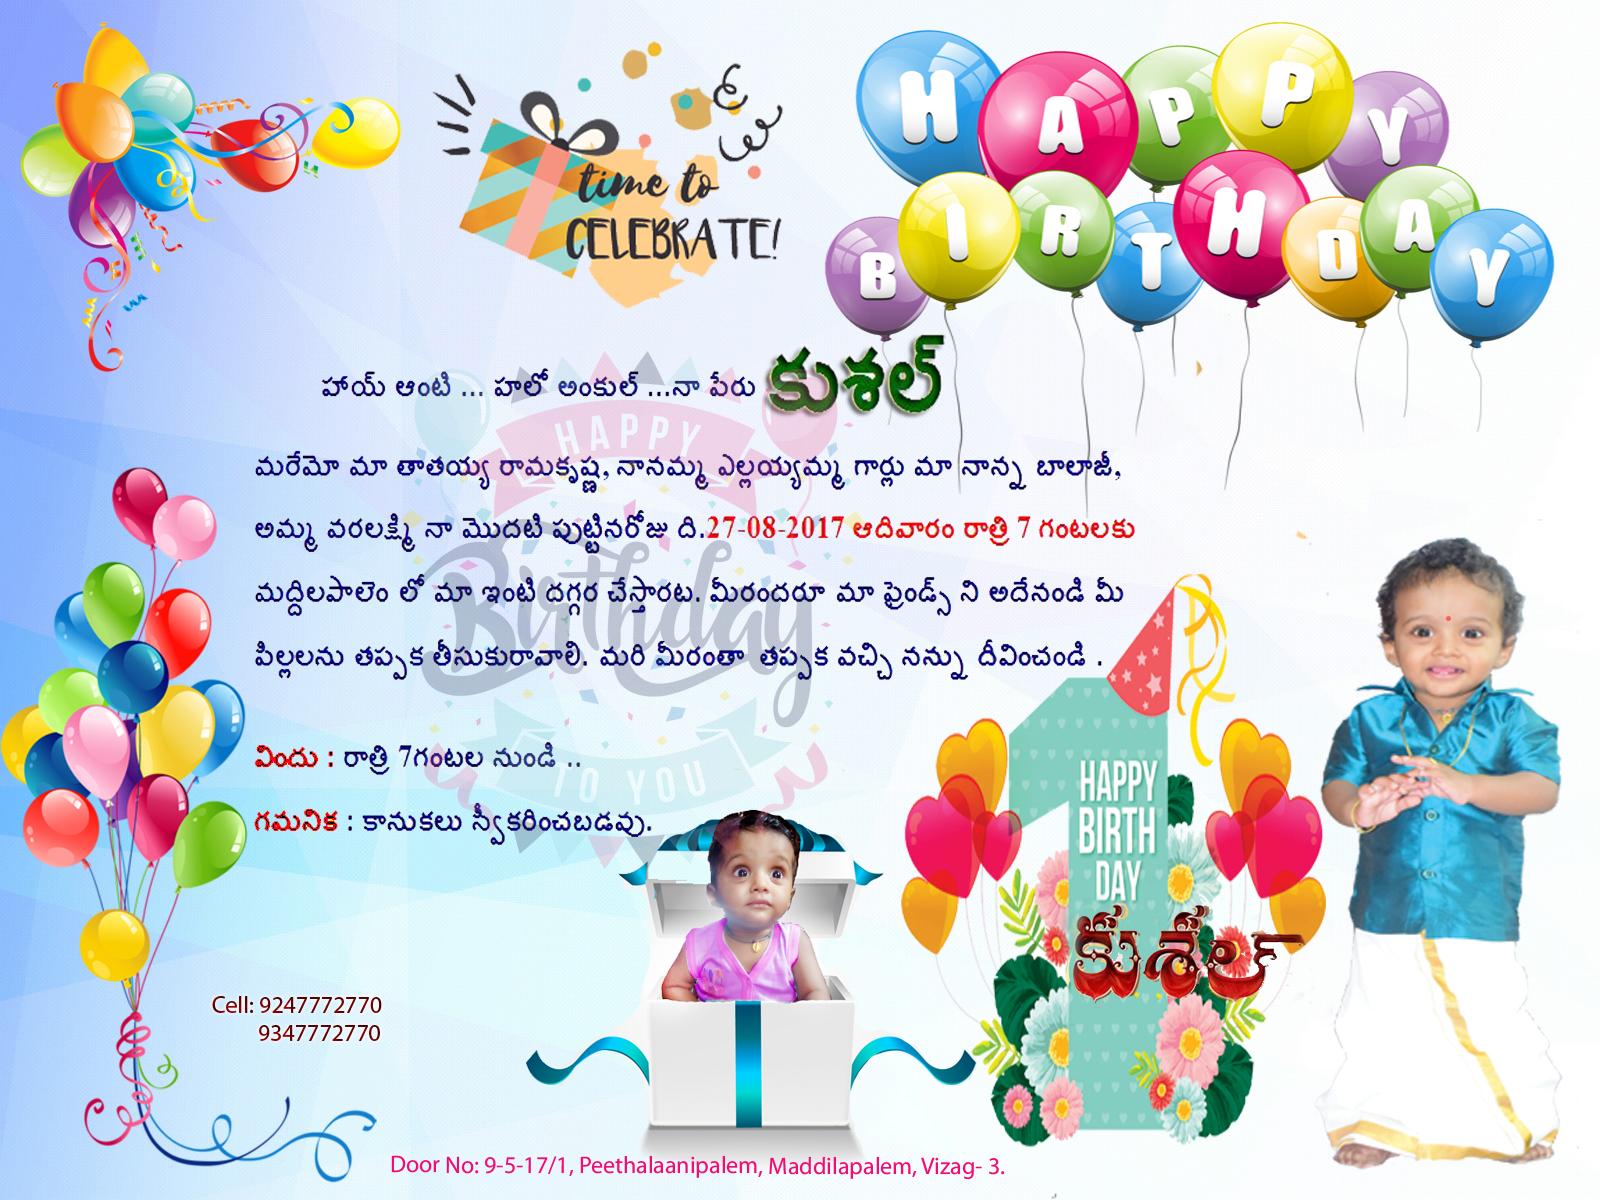 Friends pilla kushal first birthday anniversary pilla kushal first birthday anniversary invitation card sample filmwisefo Choice Image